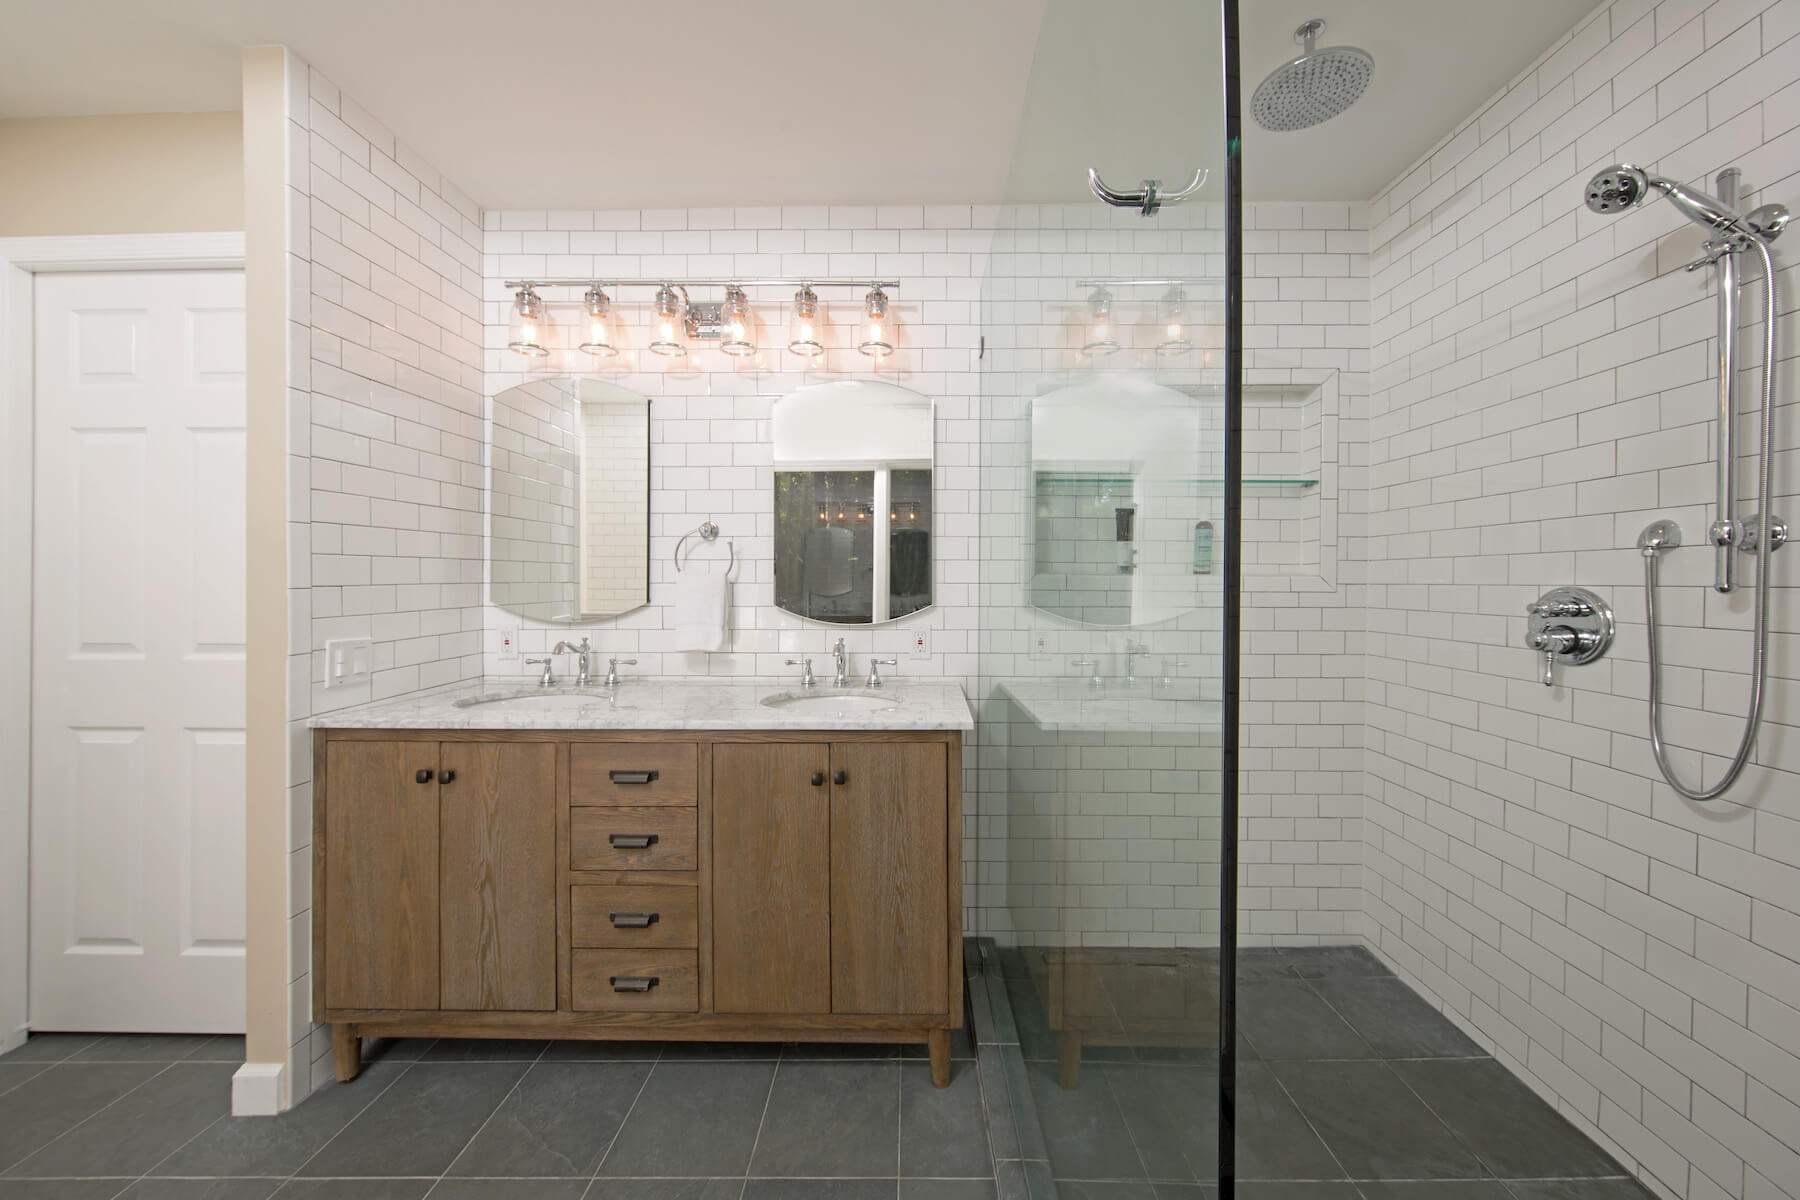 bathroom_R_9-21-17_468-1